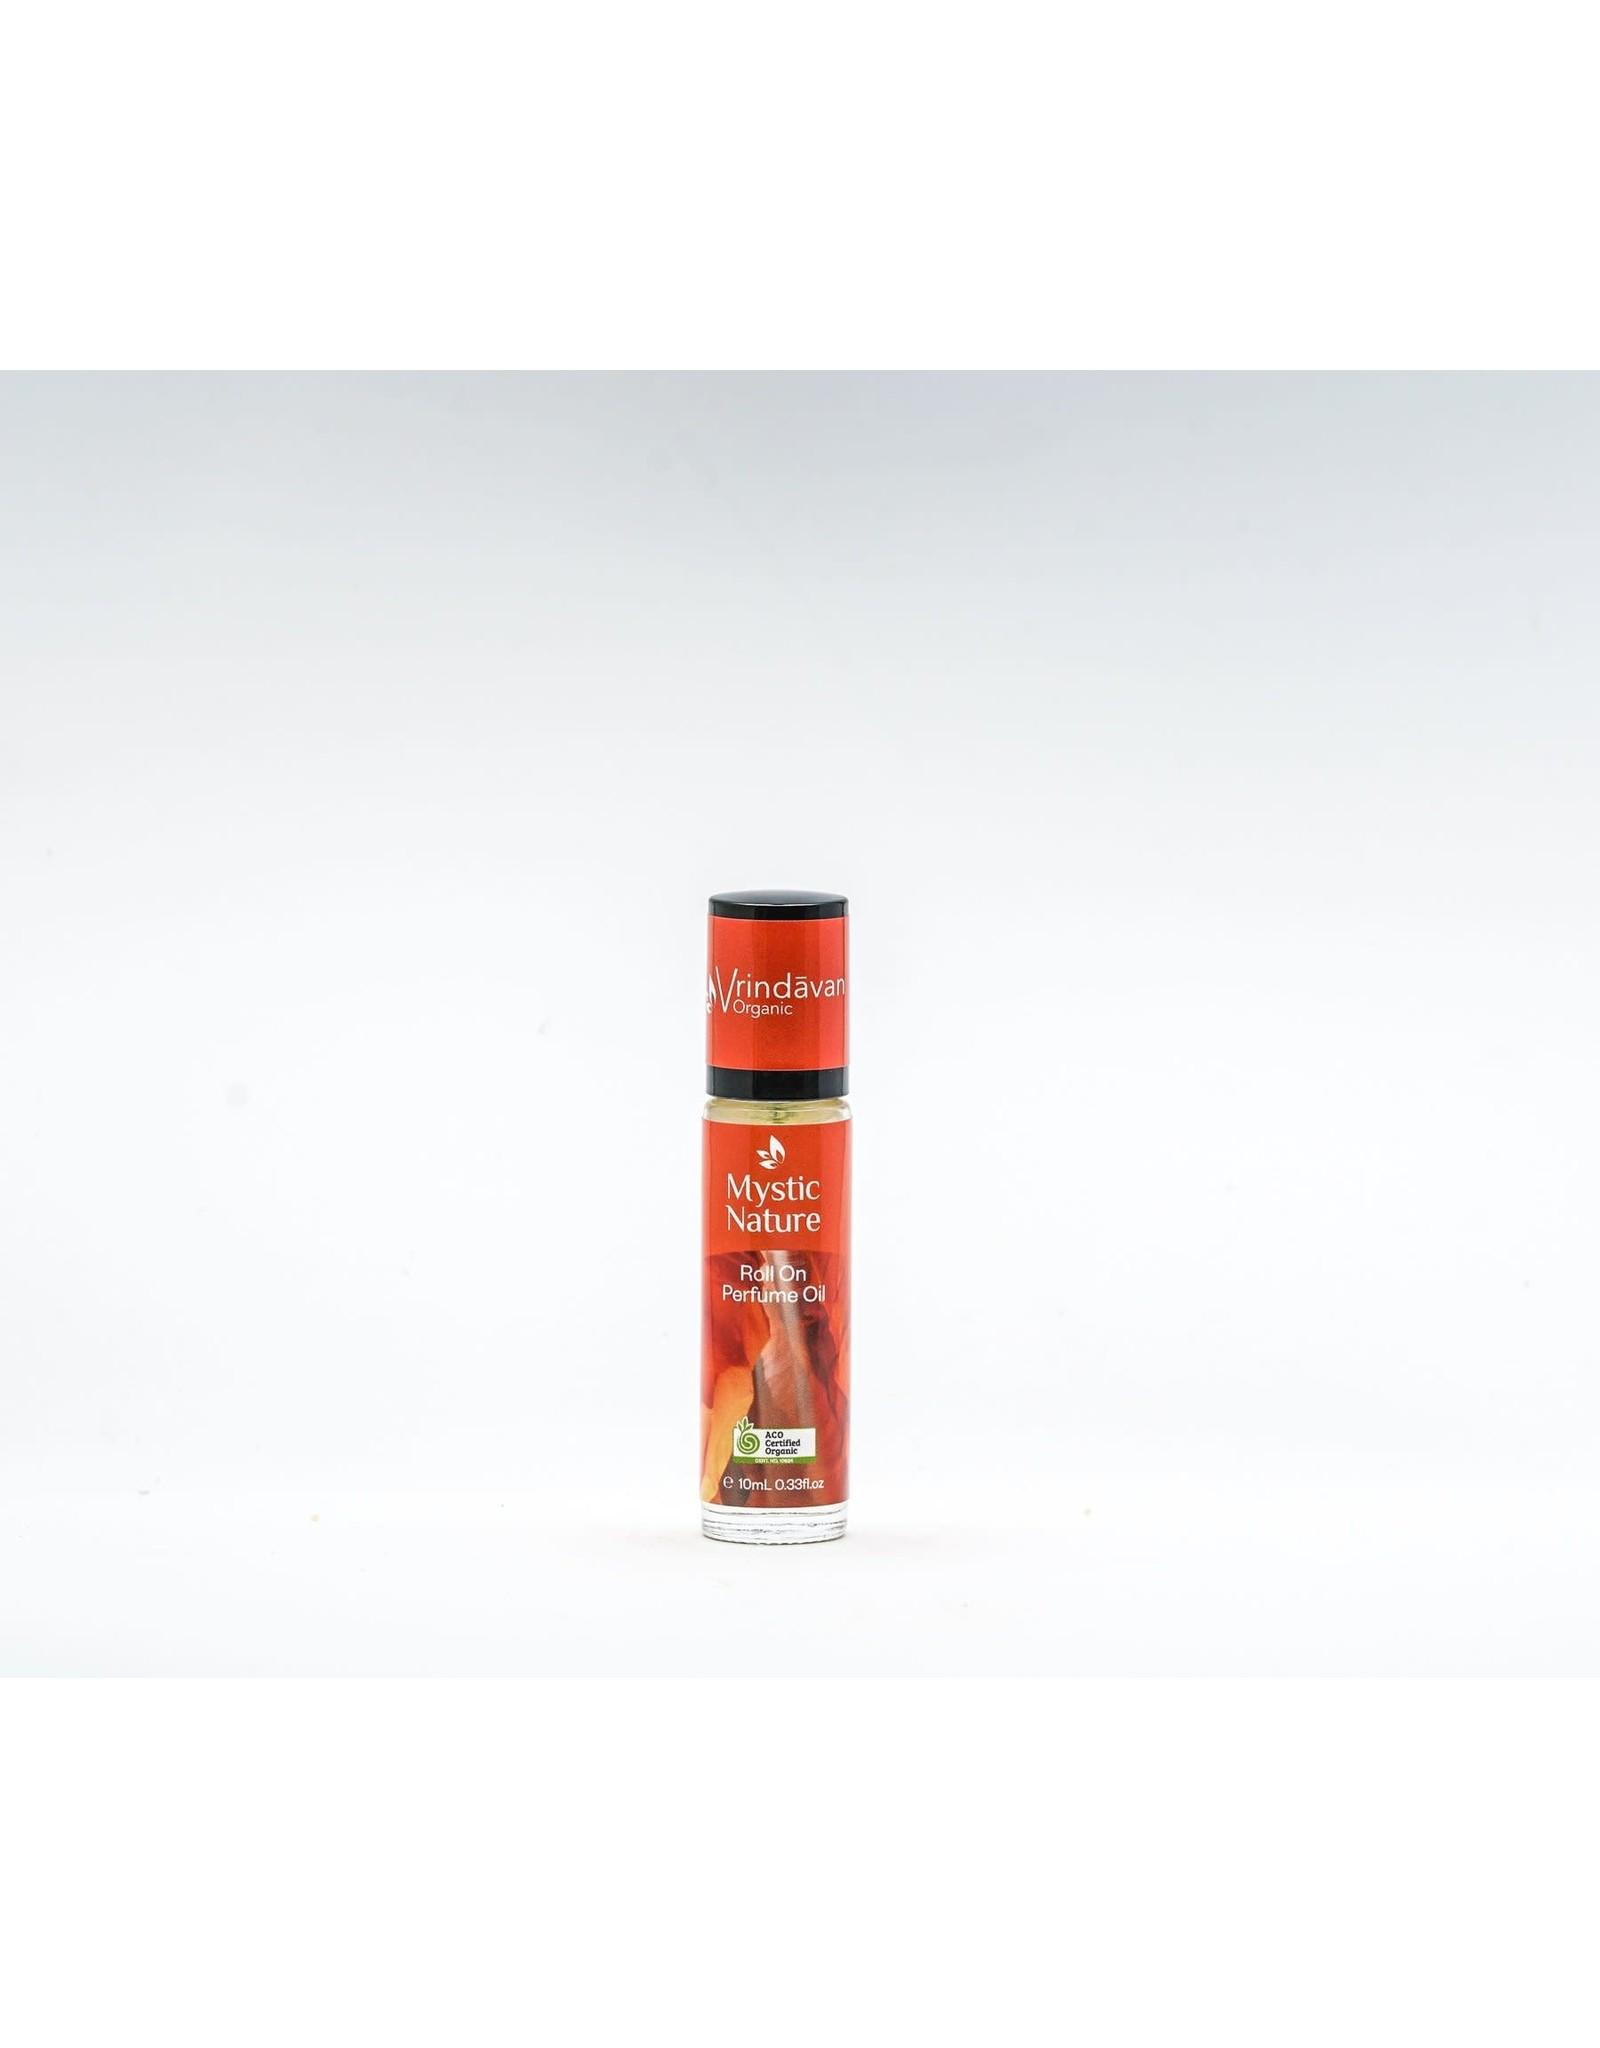 Vrindavan Organic Roll On Organic Perfume Oil 10ml